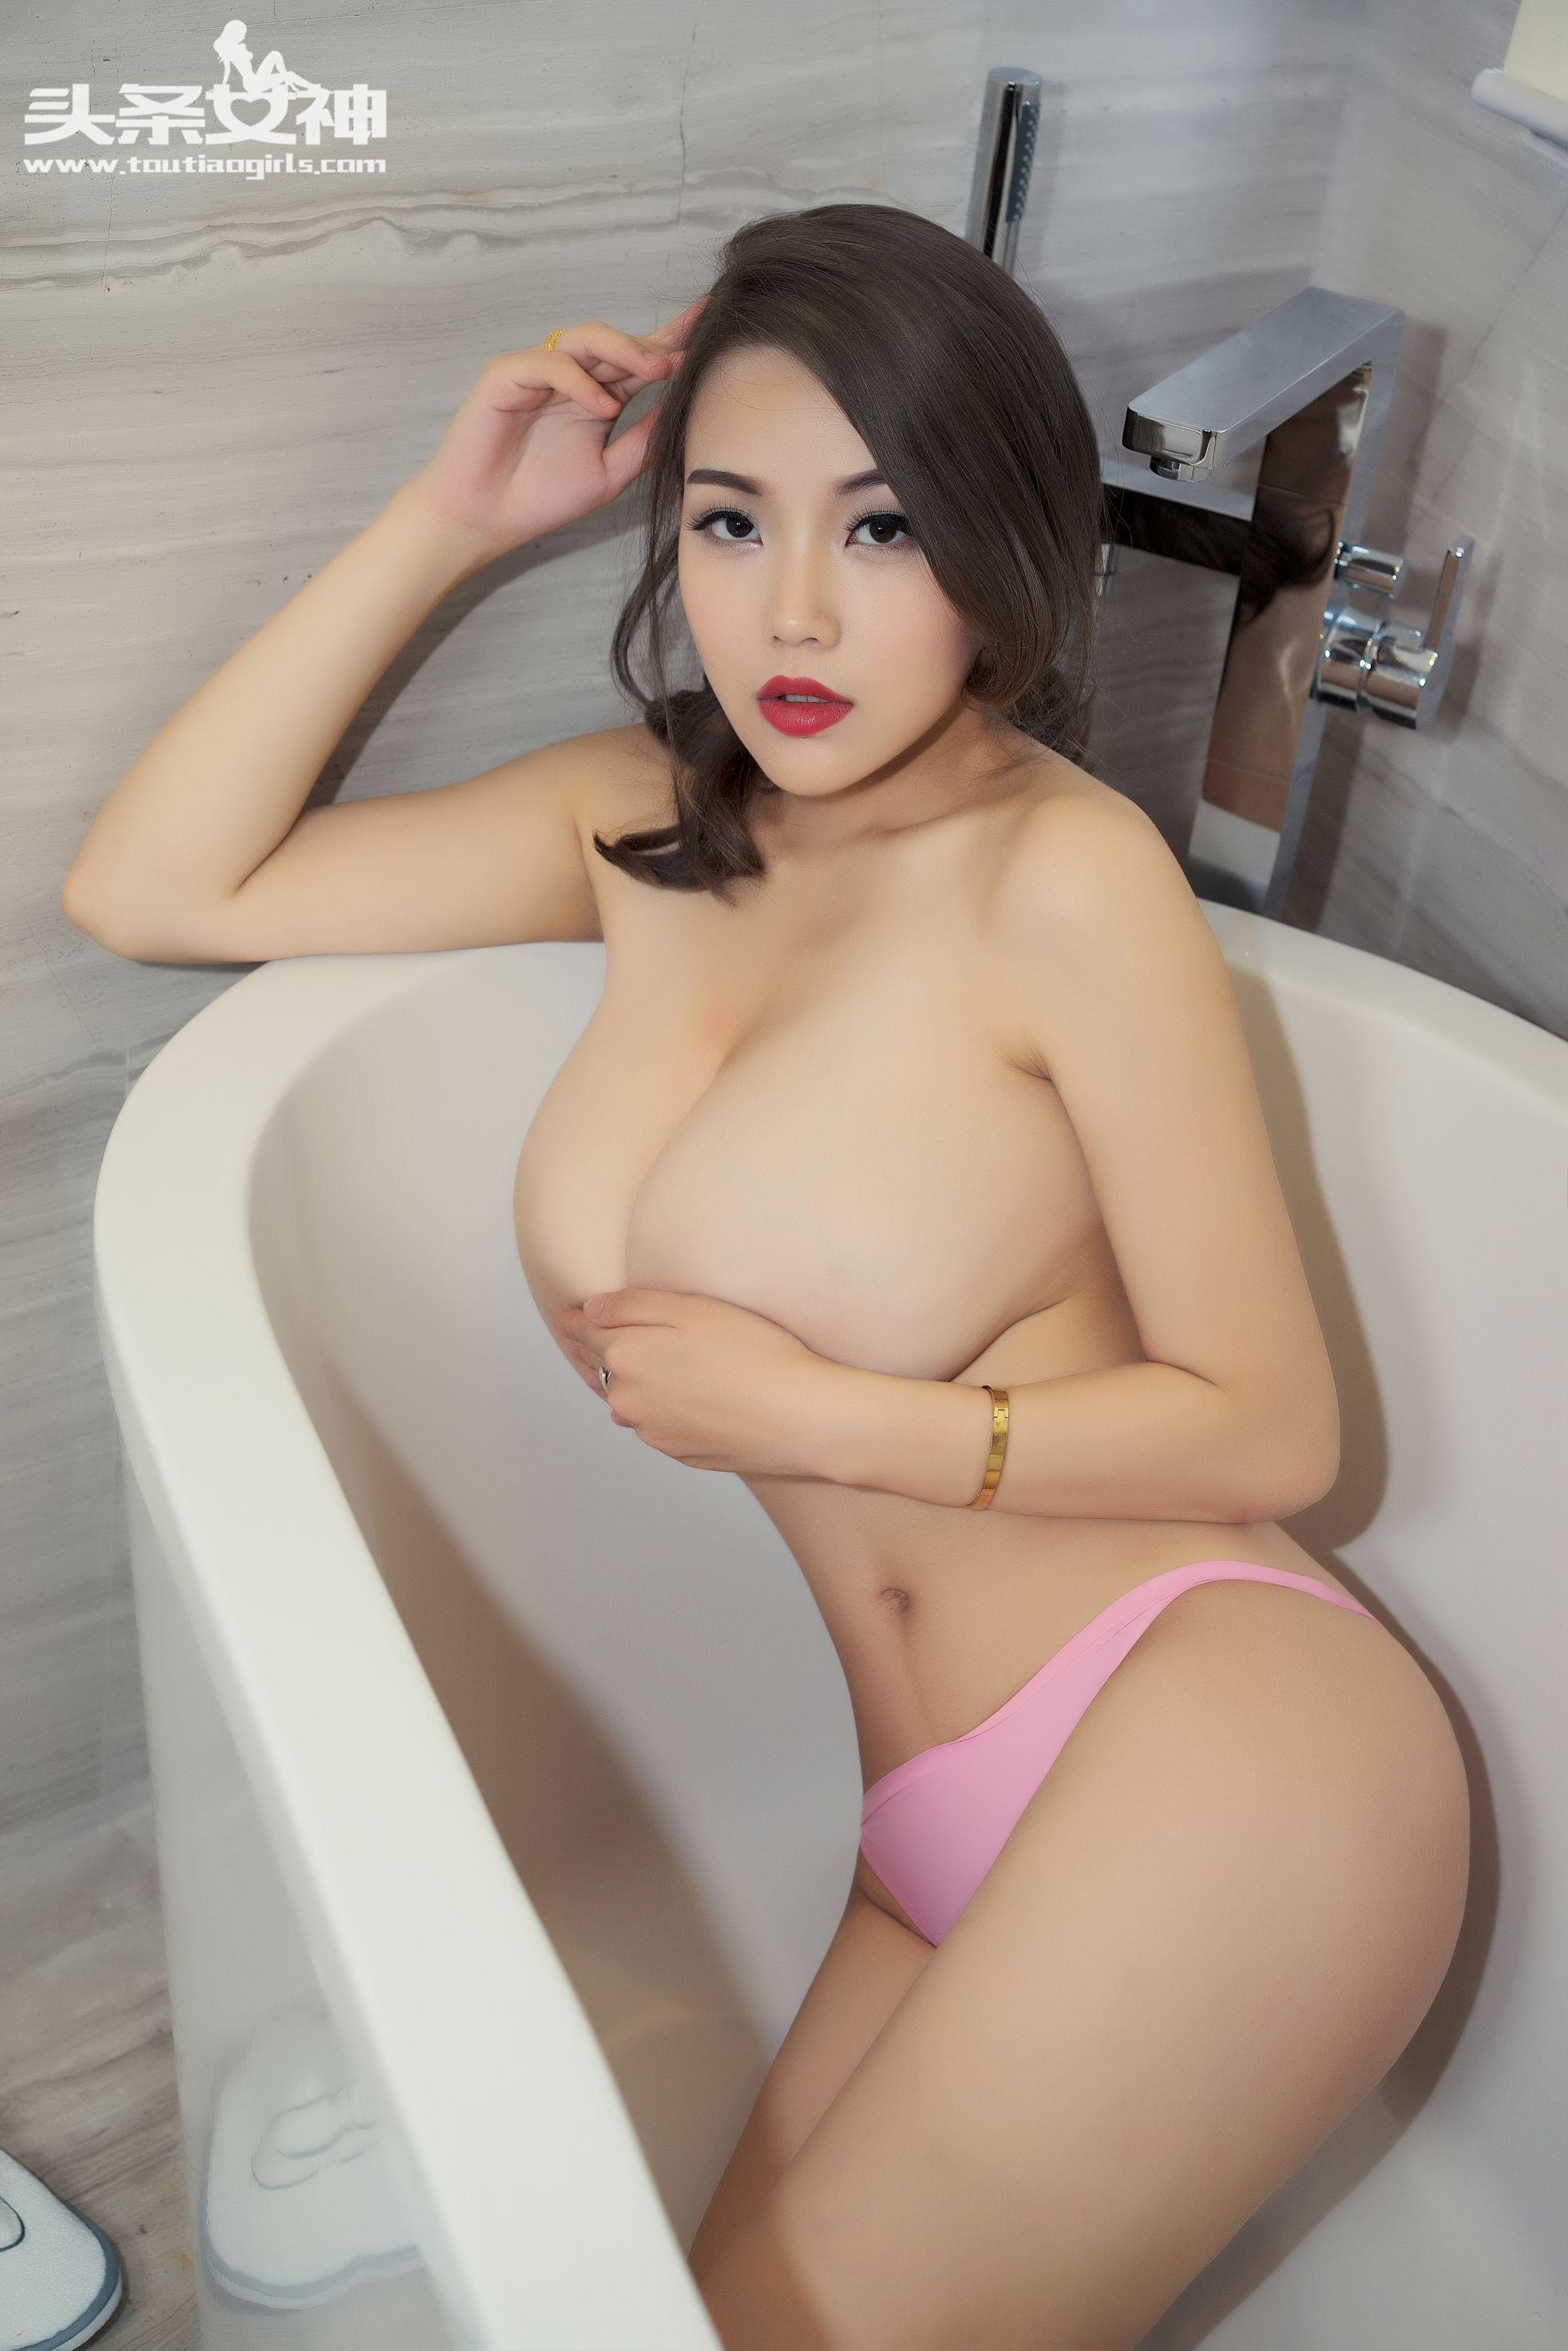 [TouTiao头条女神] No.028 阳阳 - 性感巨乳女帝 _第10(3)张图 | Asian girls ...